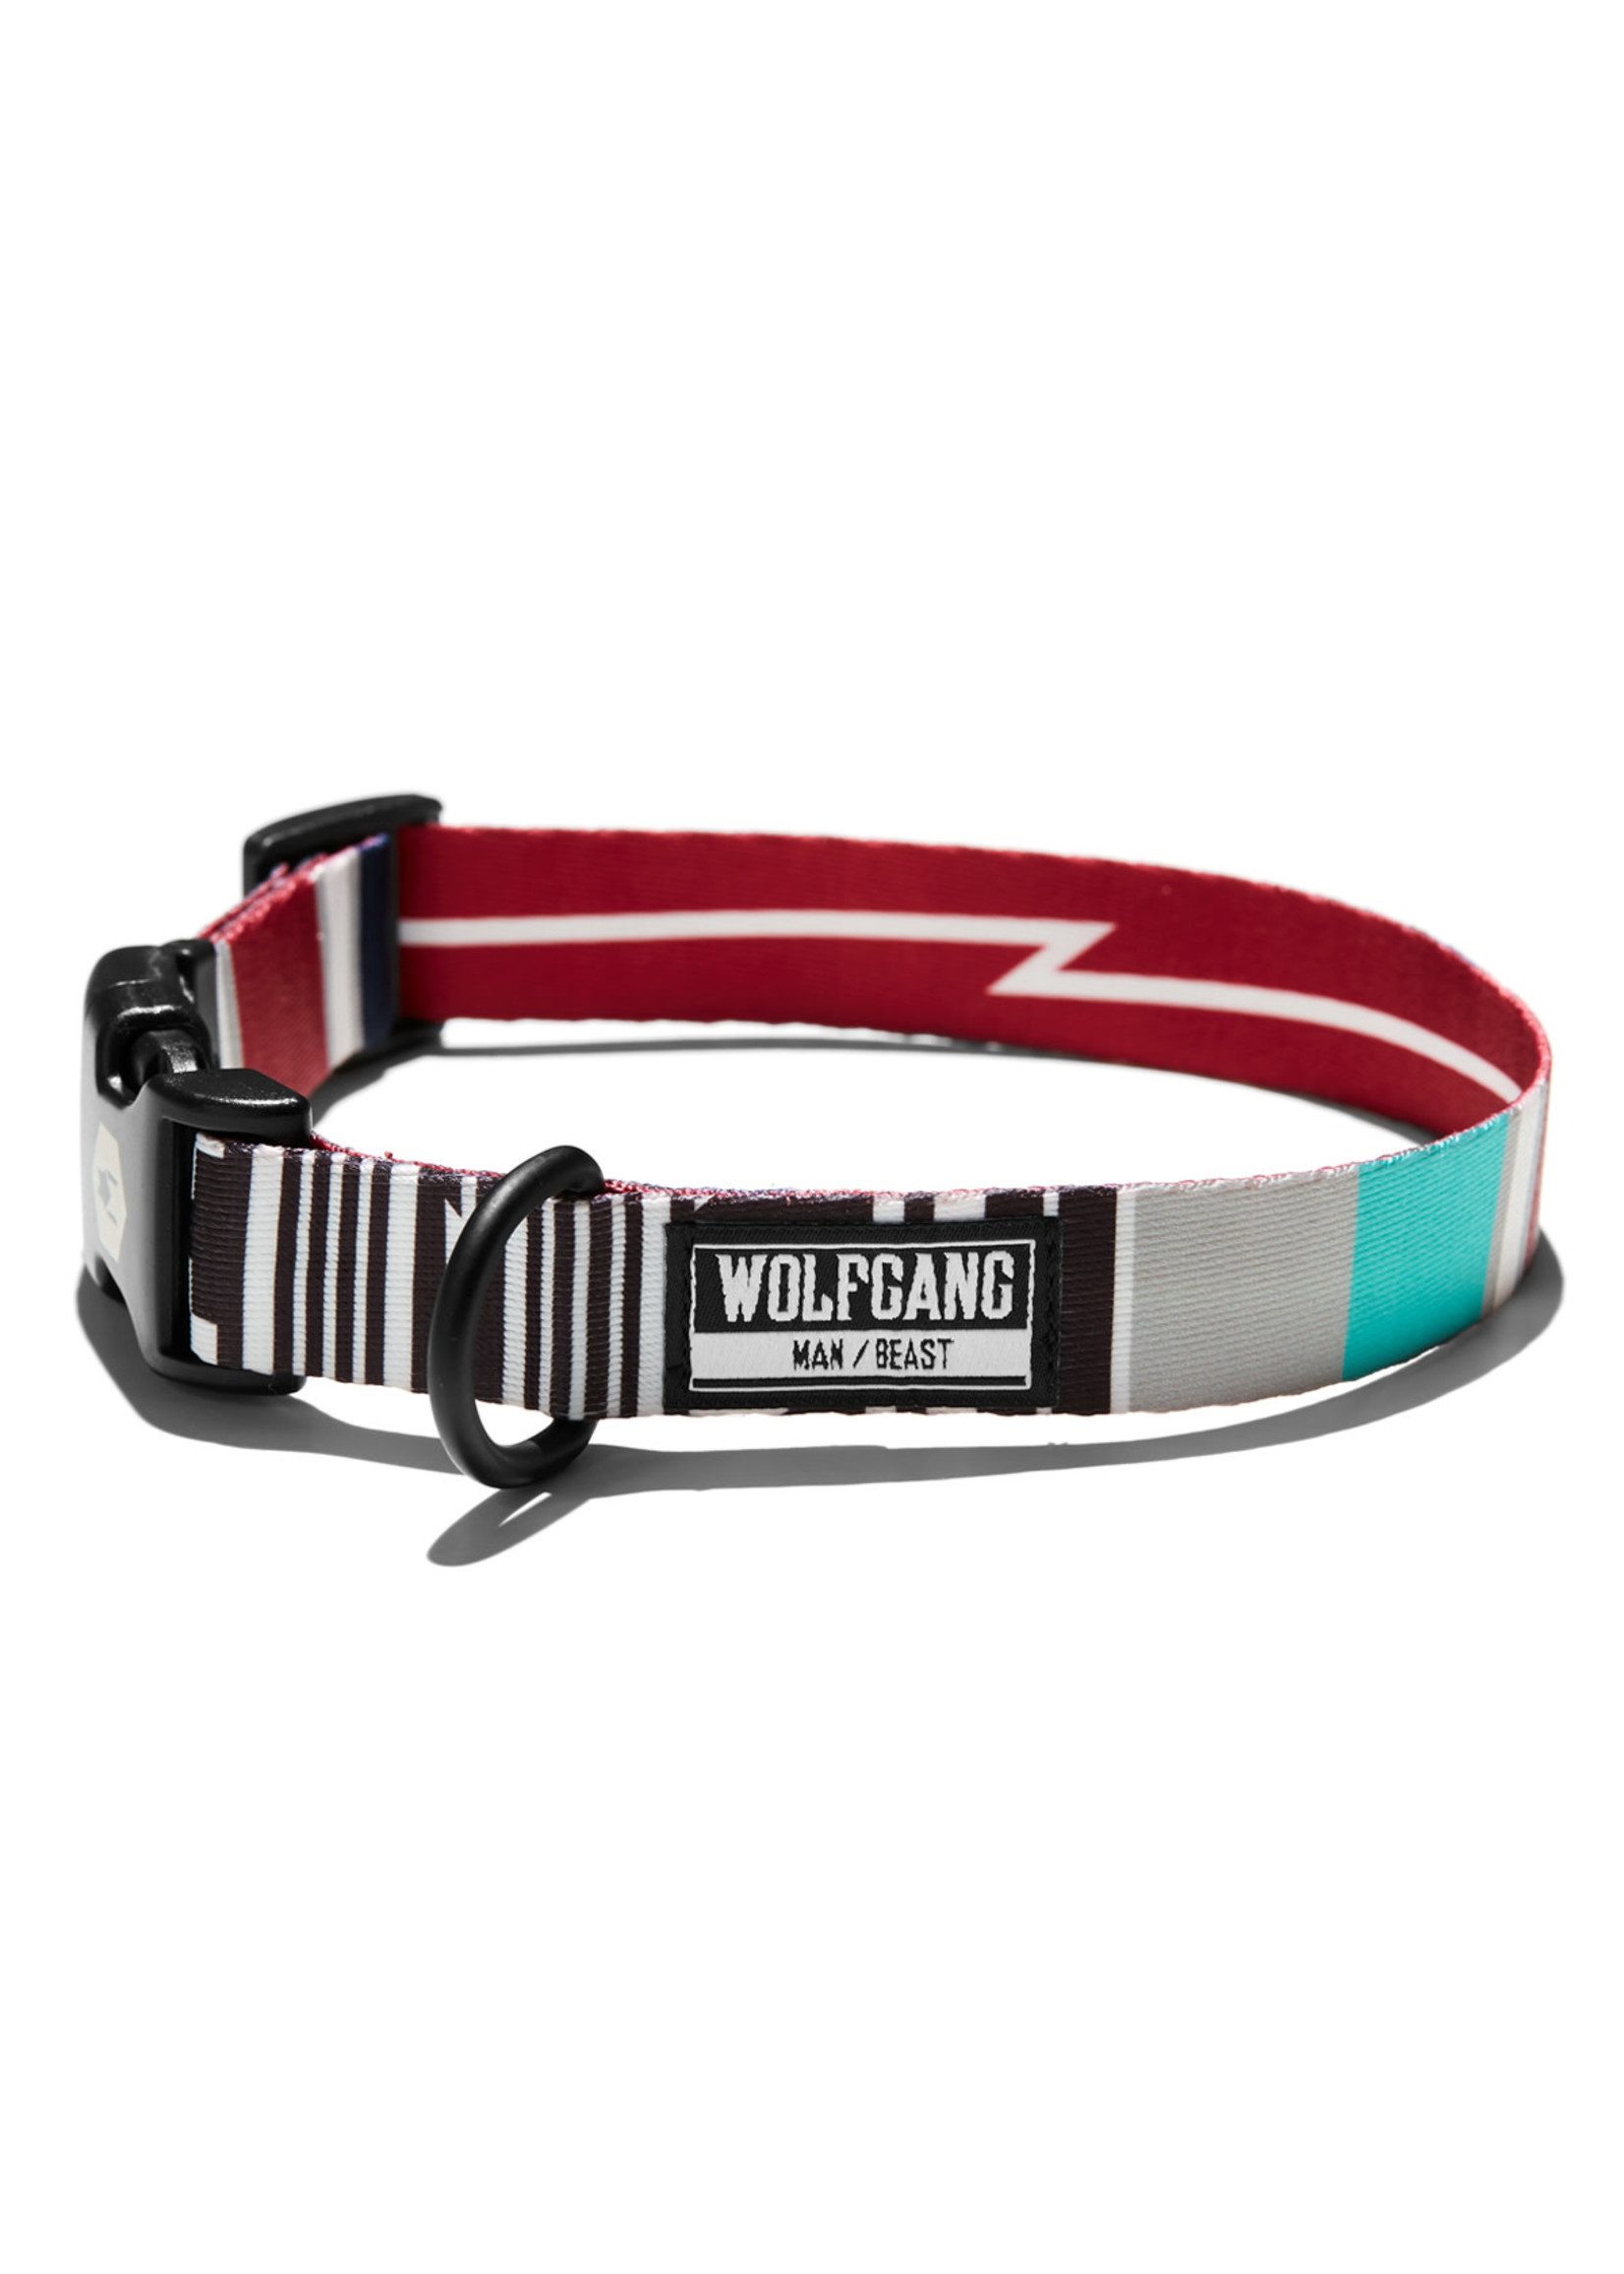 Wolfgang Man & Beast Wolfgang Culture Shock Collar M